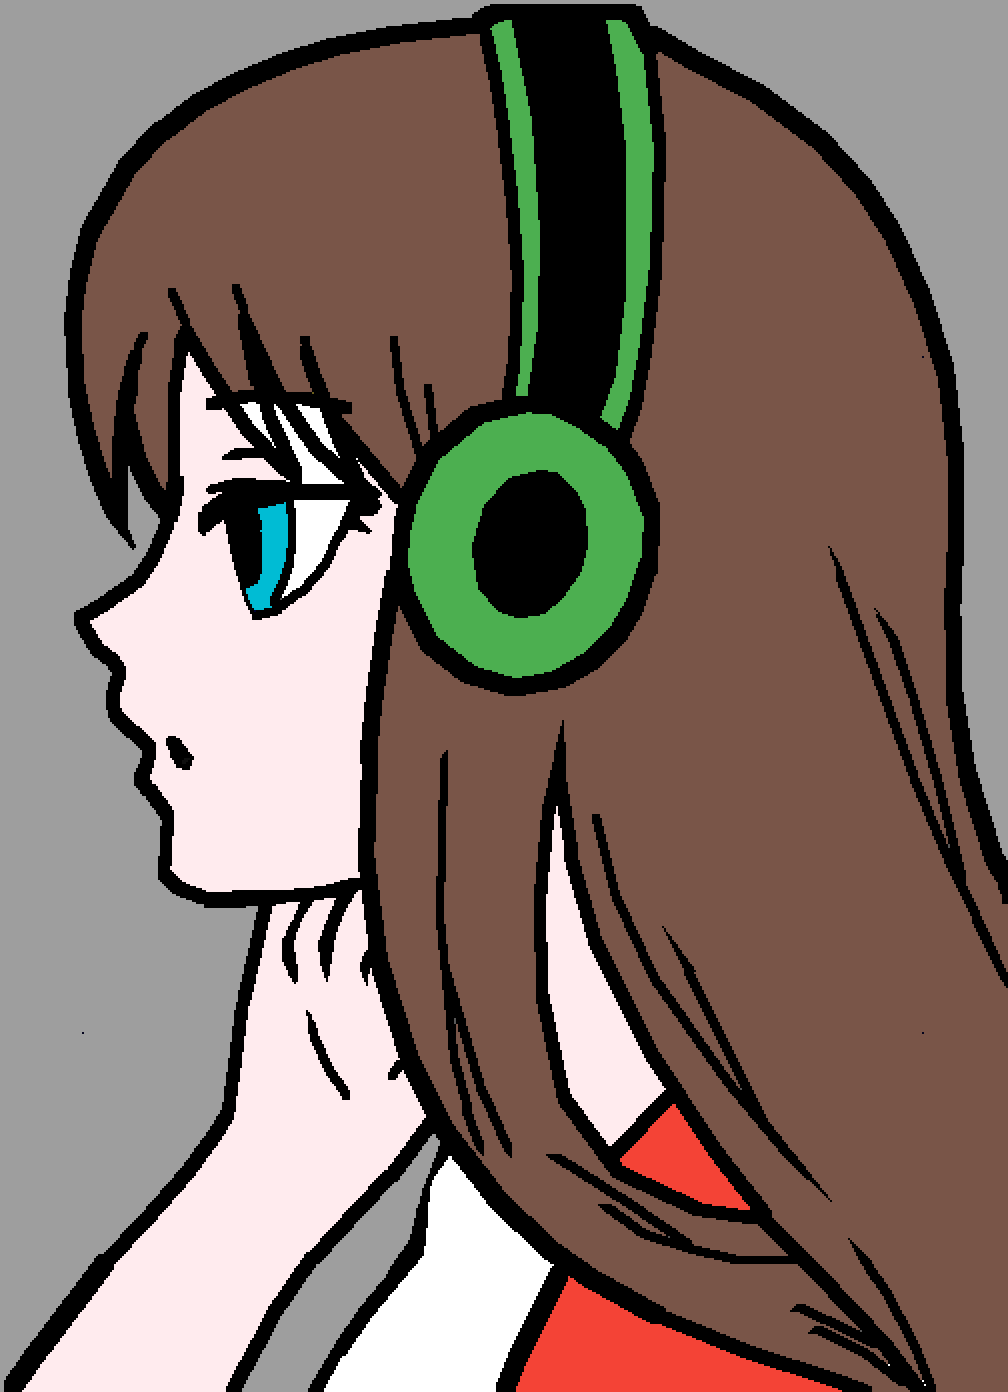 anime girl by dat-one-unicorn